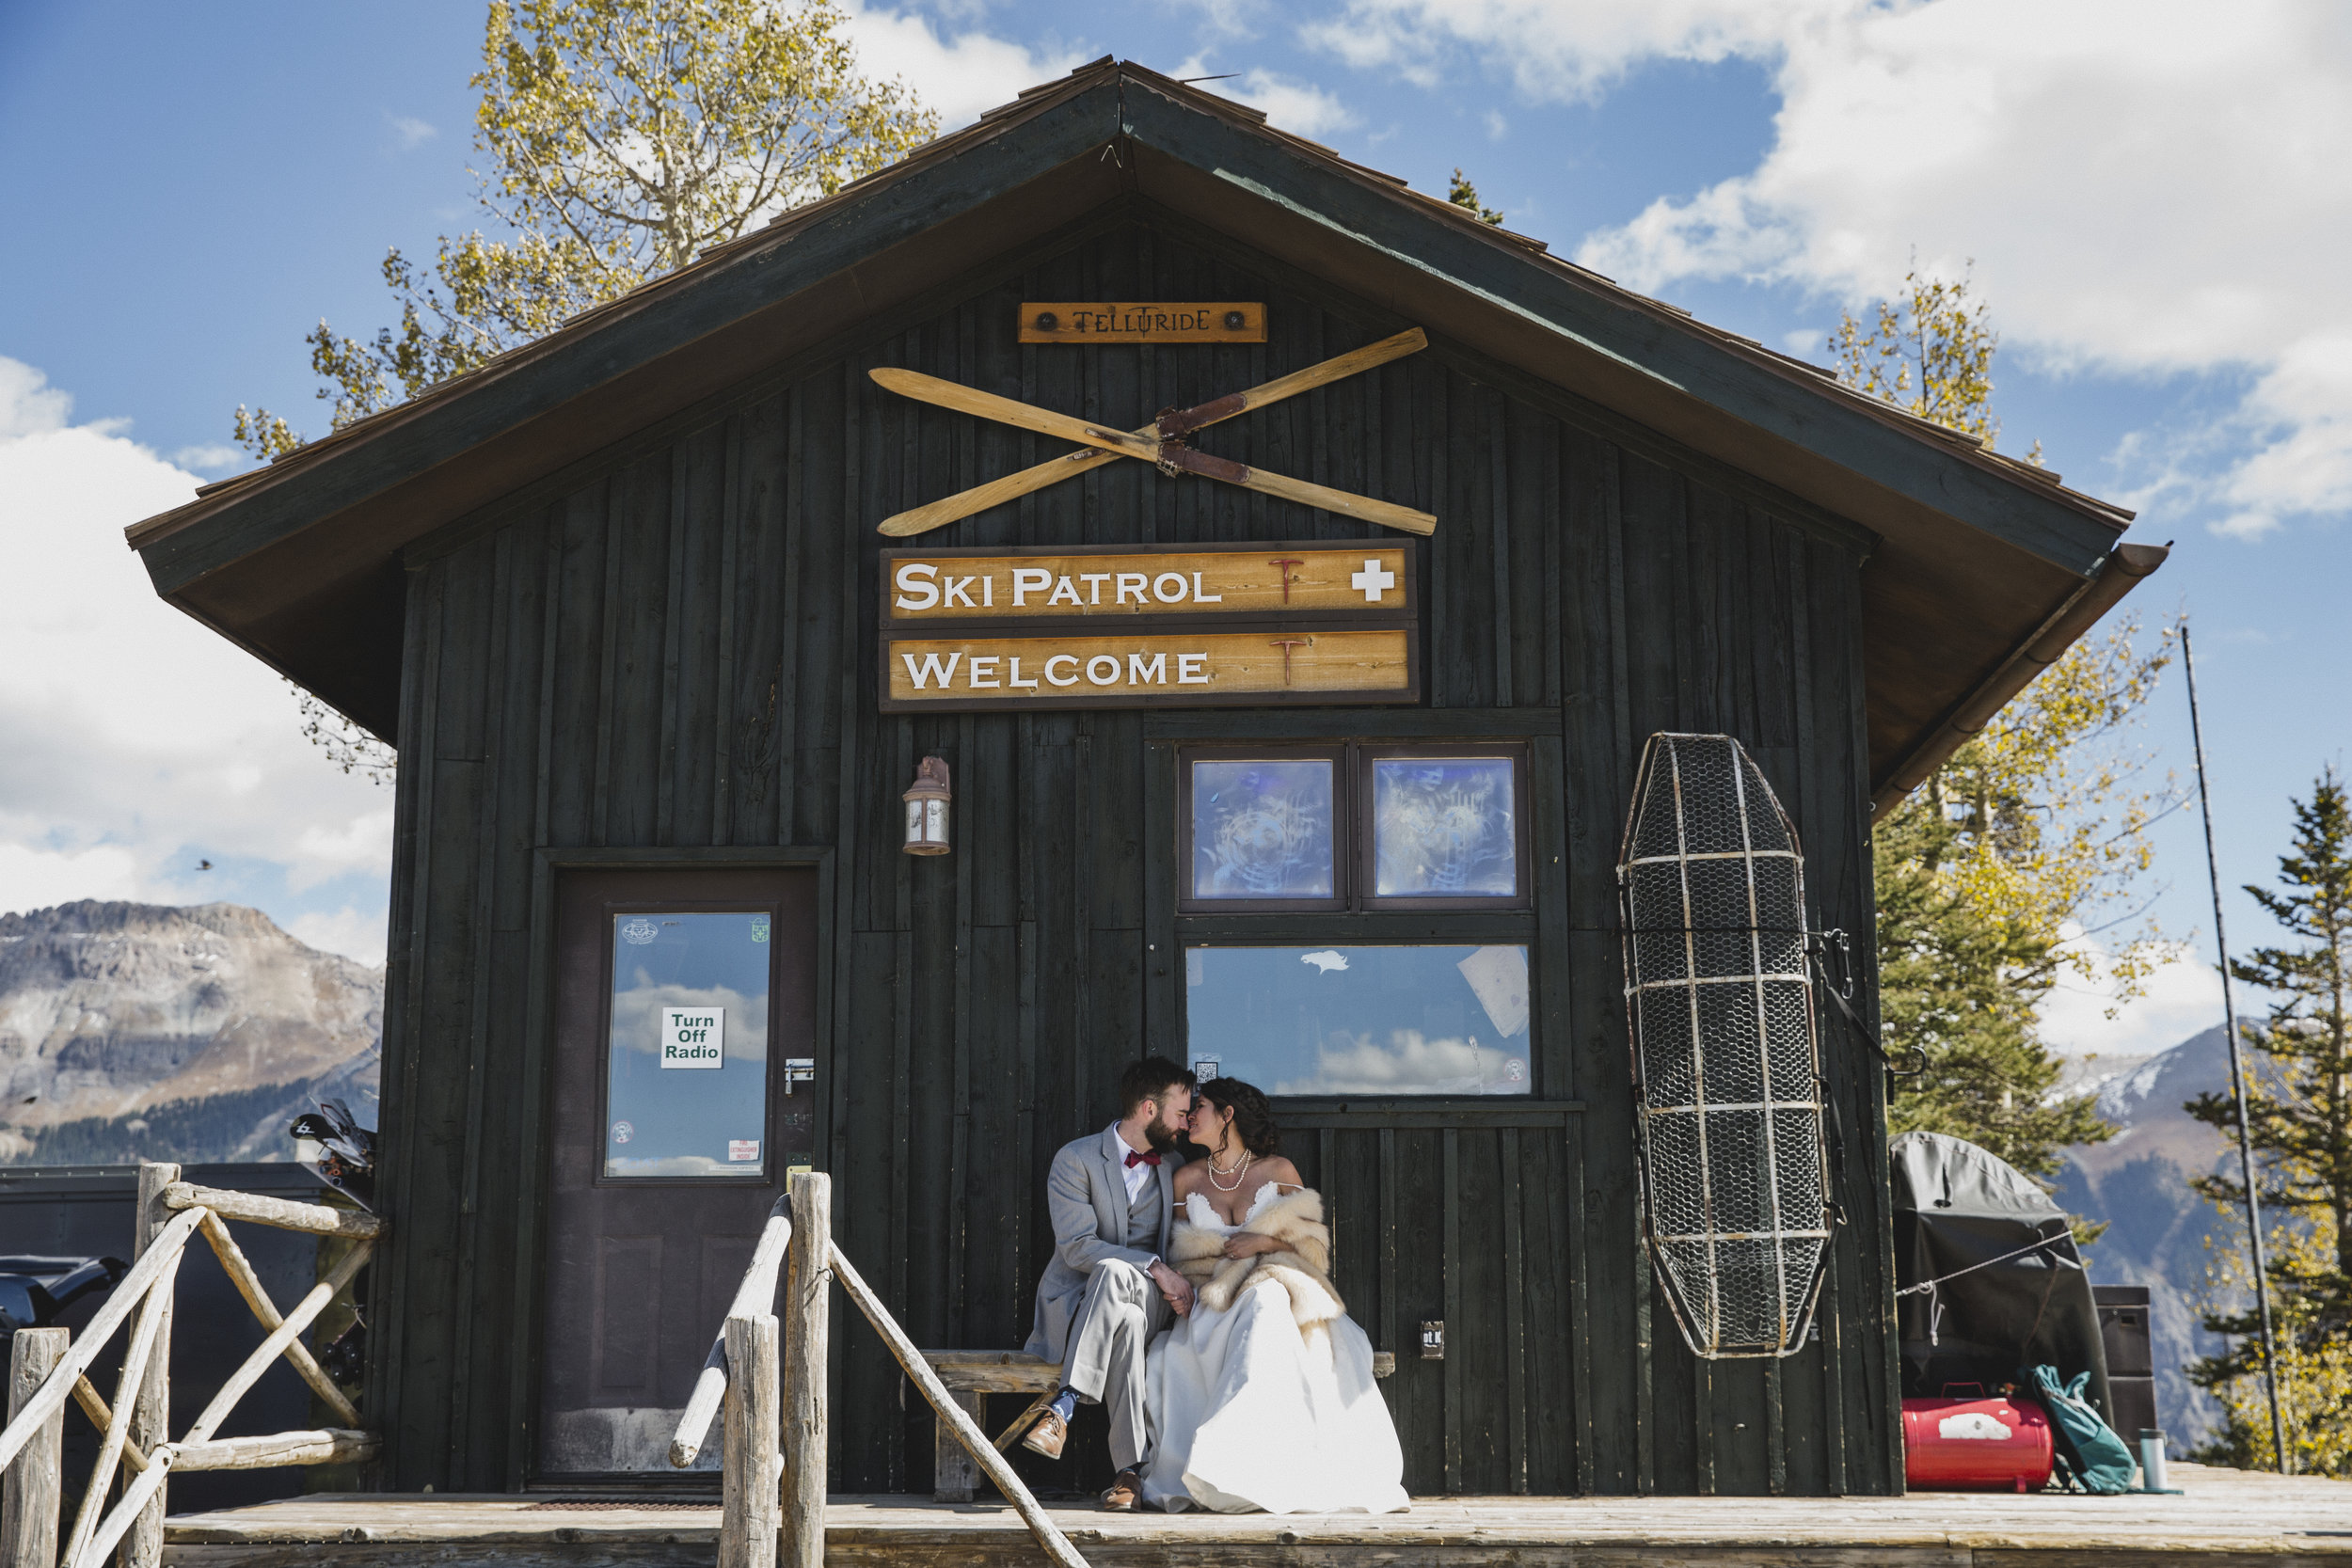 NE-LeahandAshtonphotography-Telluride-Wedding-Photography-9122.jpg